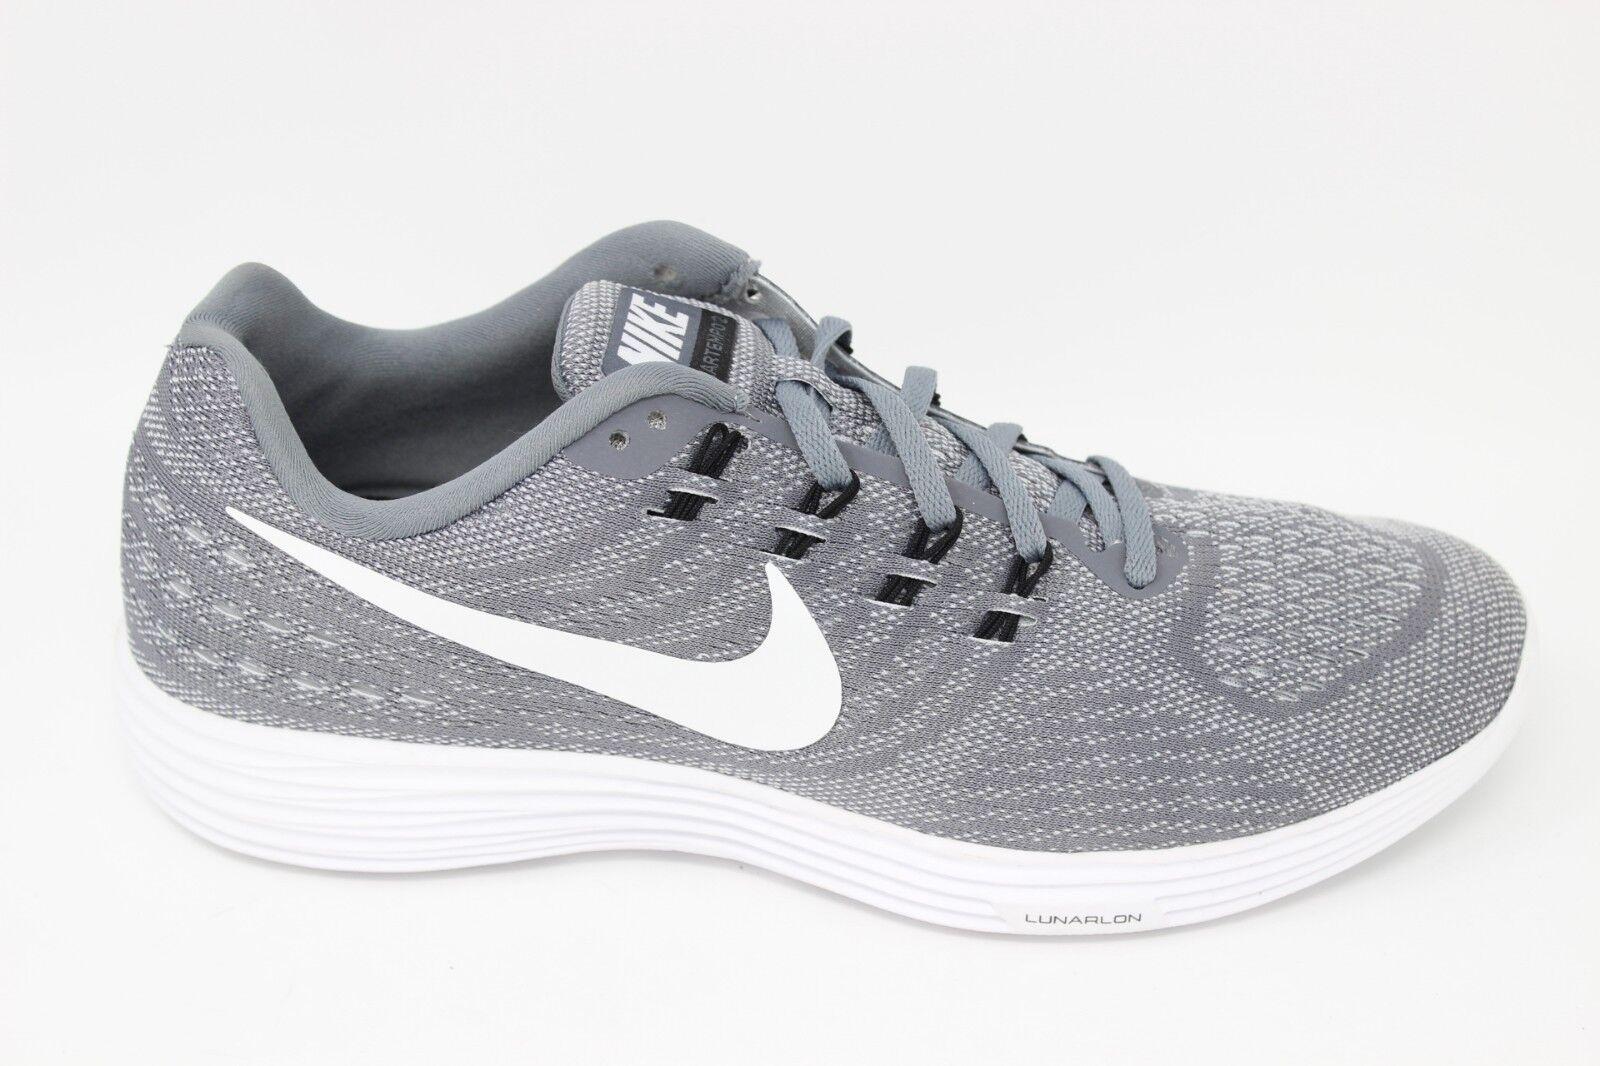 promo code 5763d 93fcf Nike Men s Lunartempo 2 2 2 818097 005 Cool Grey White-Black Brand New  ed6018